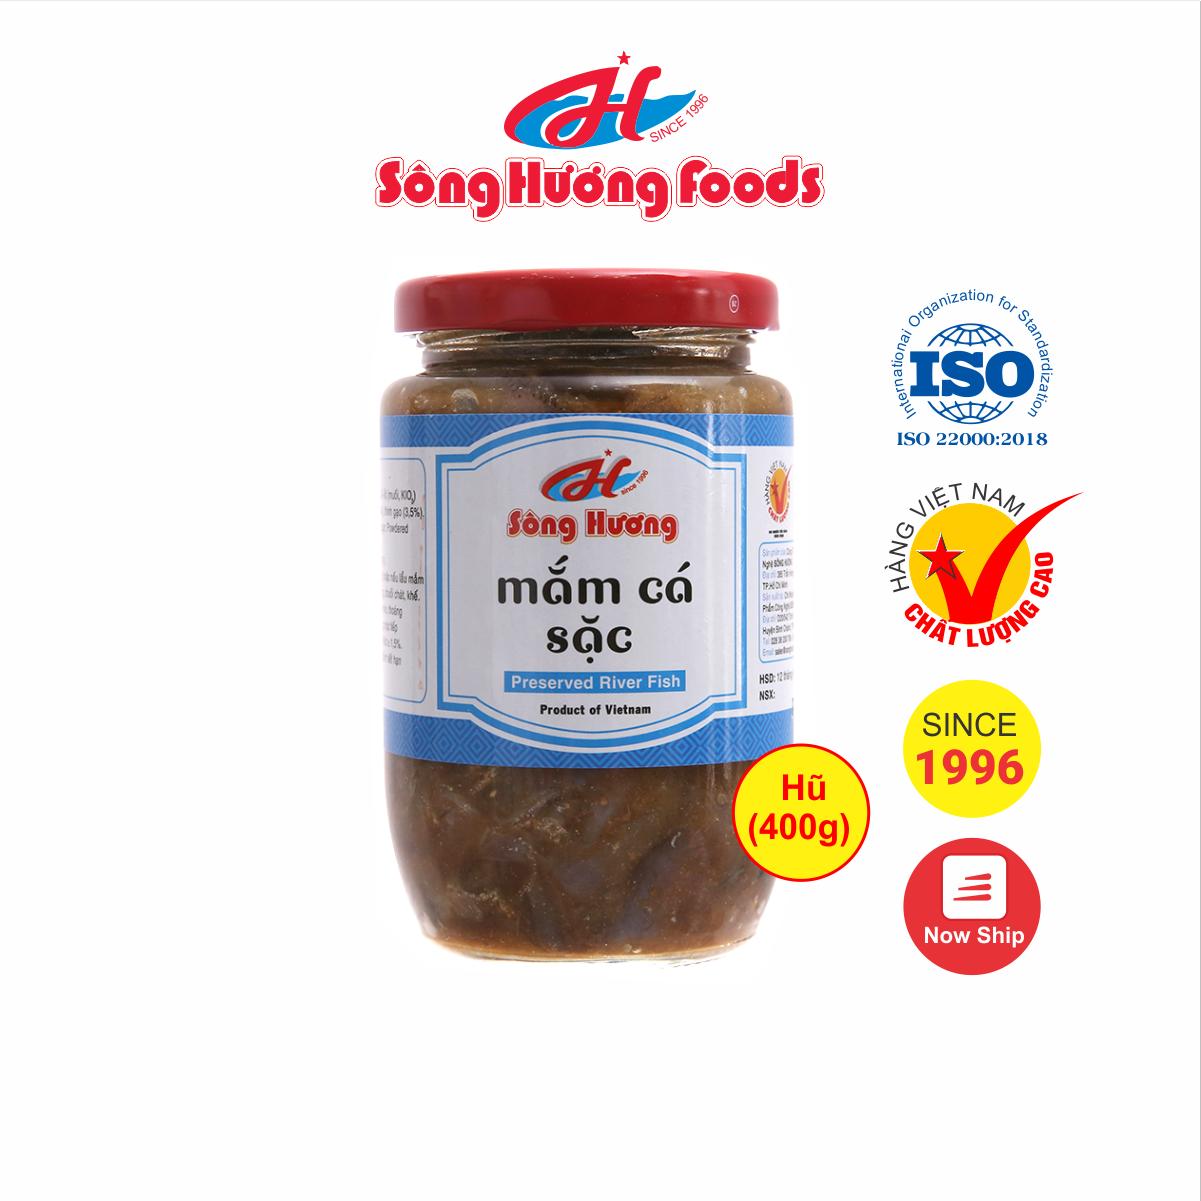 Mắm Cá Sặc Sông Hương Foods Hũ 400g